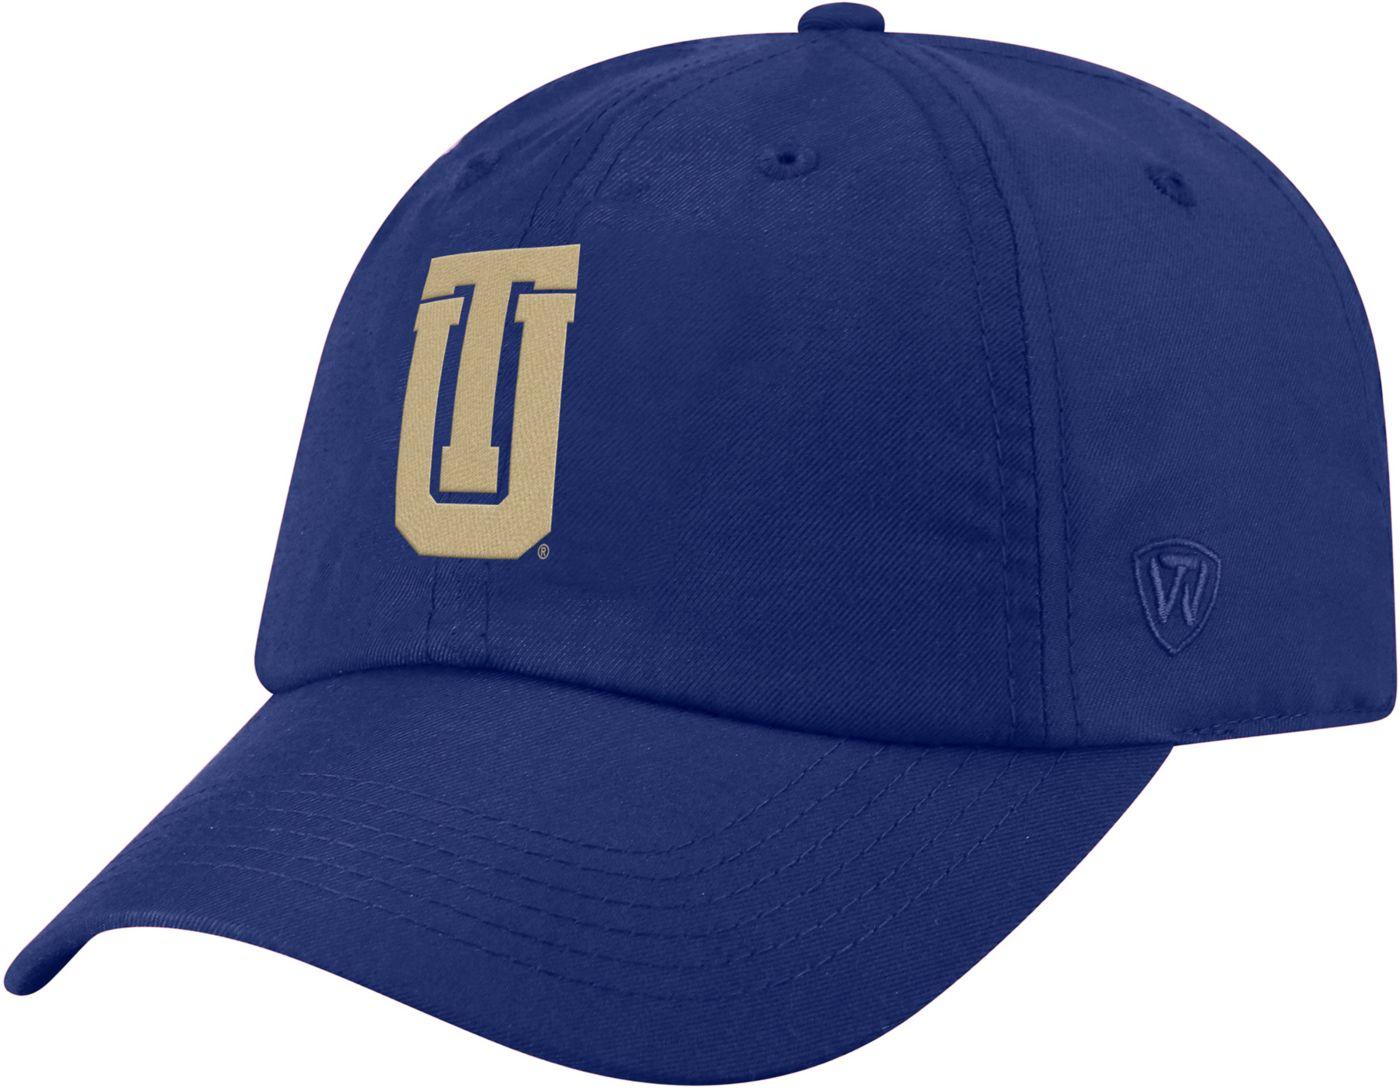 Top of the World Men's Tulsa Golden Hurricane Blue Staple Adjustable Hat